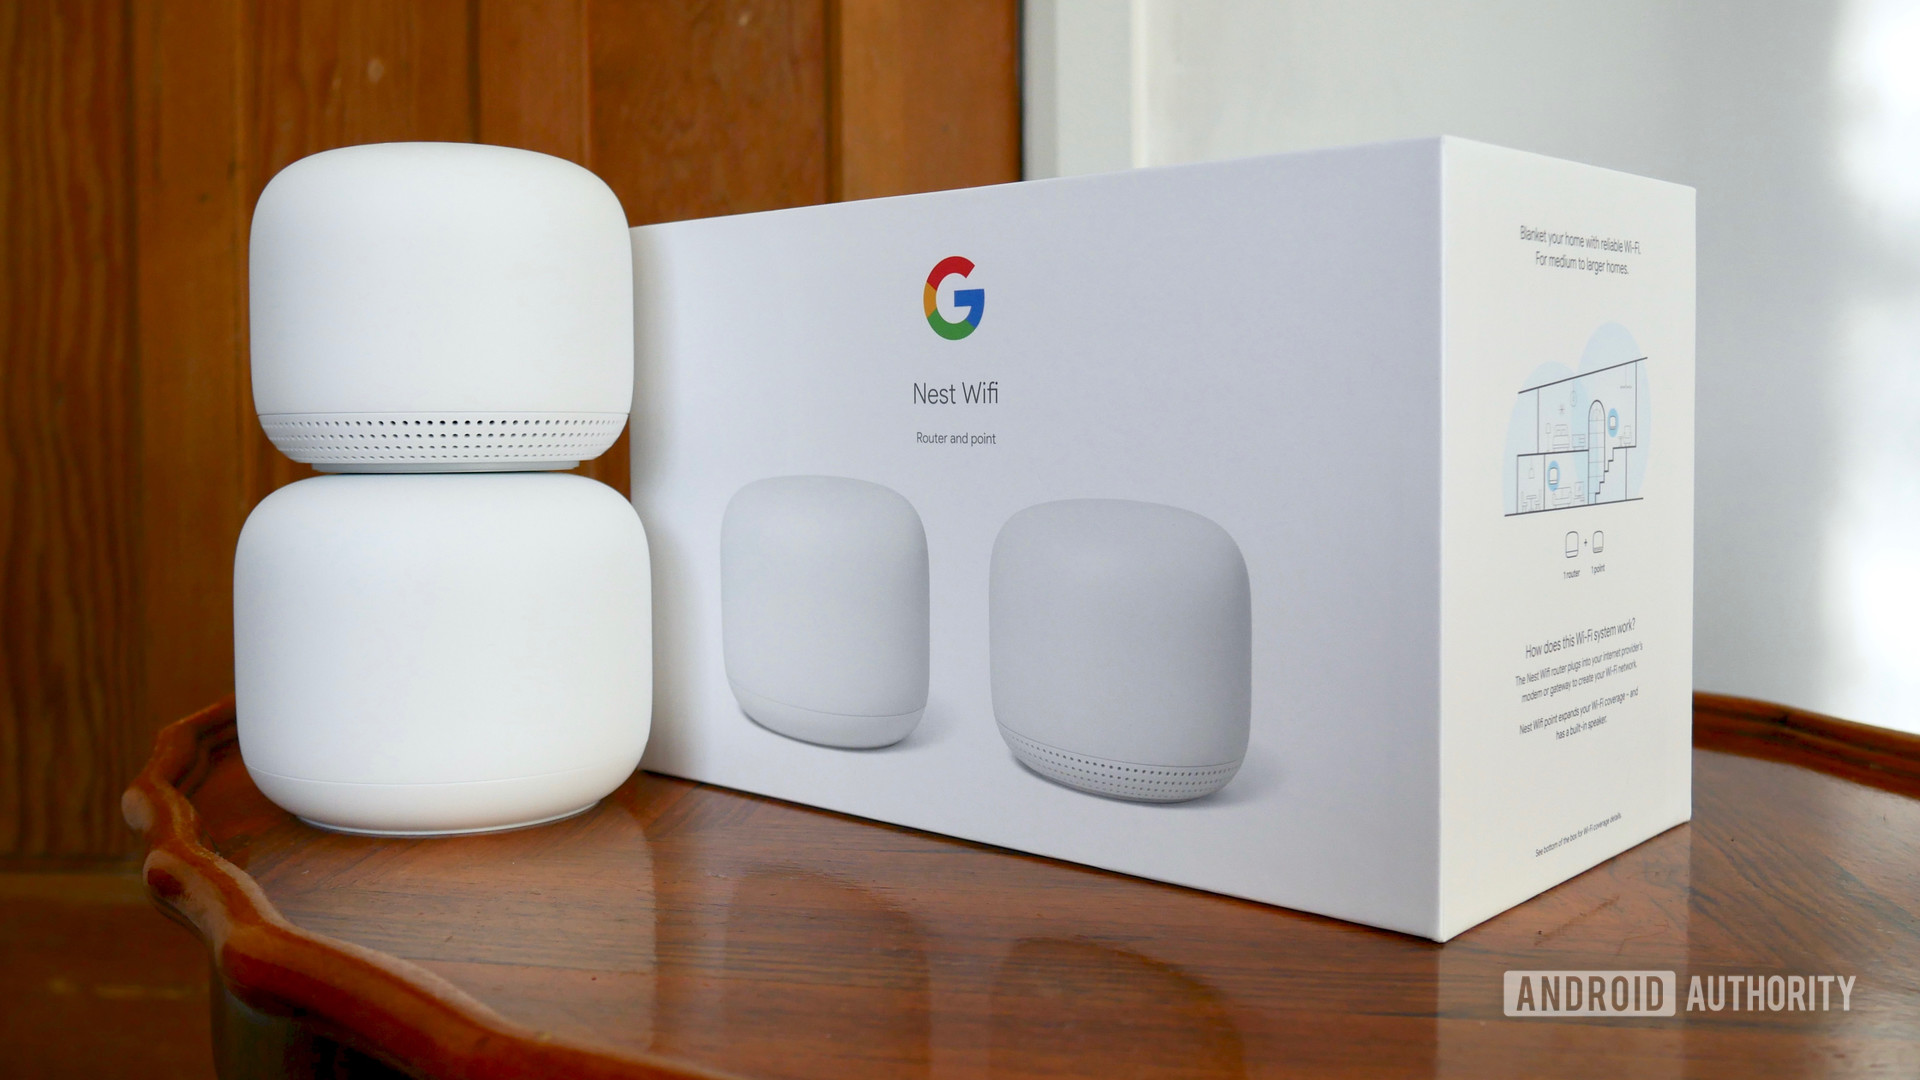 google nest wifi review next to box 2